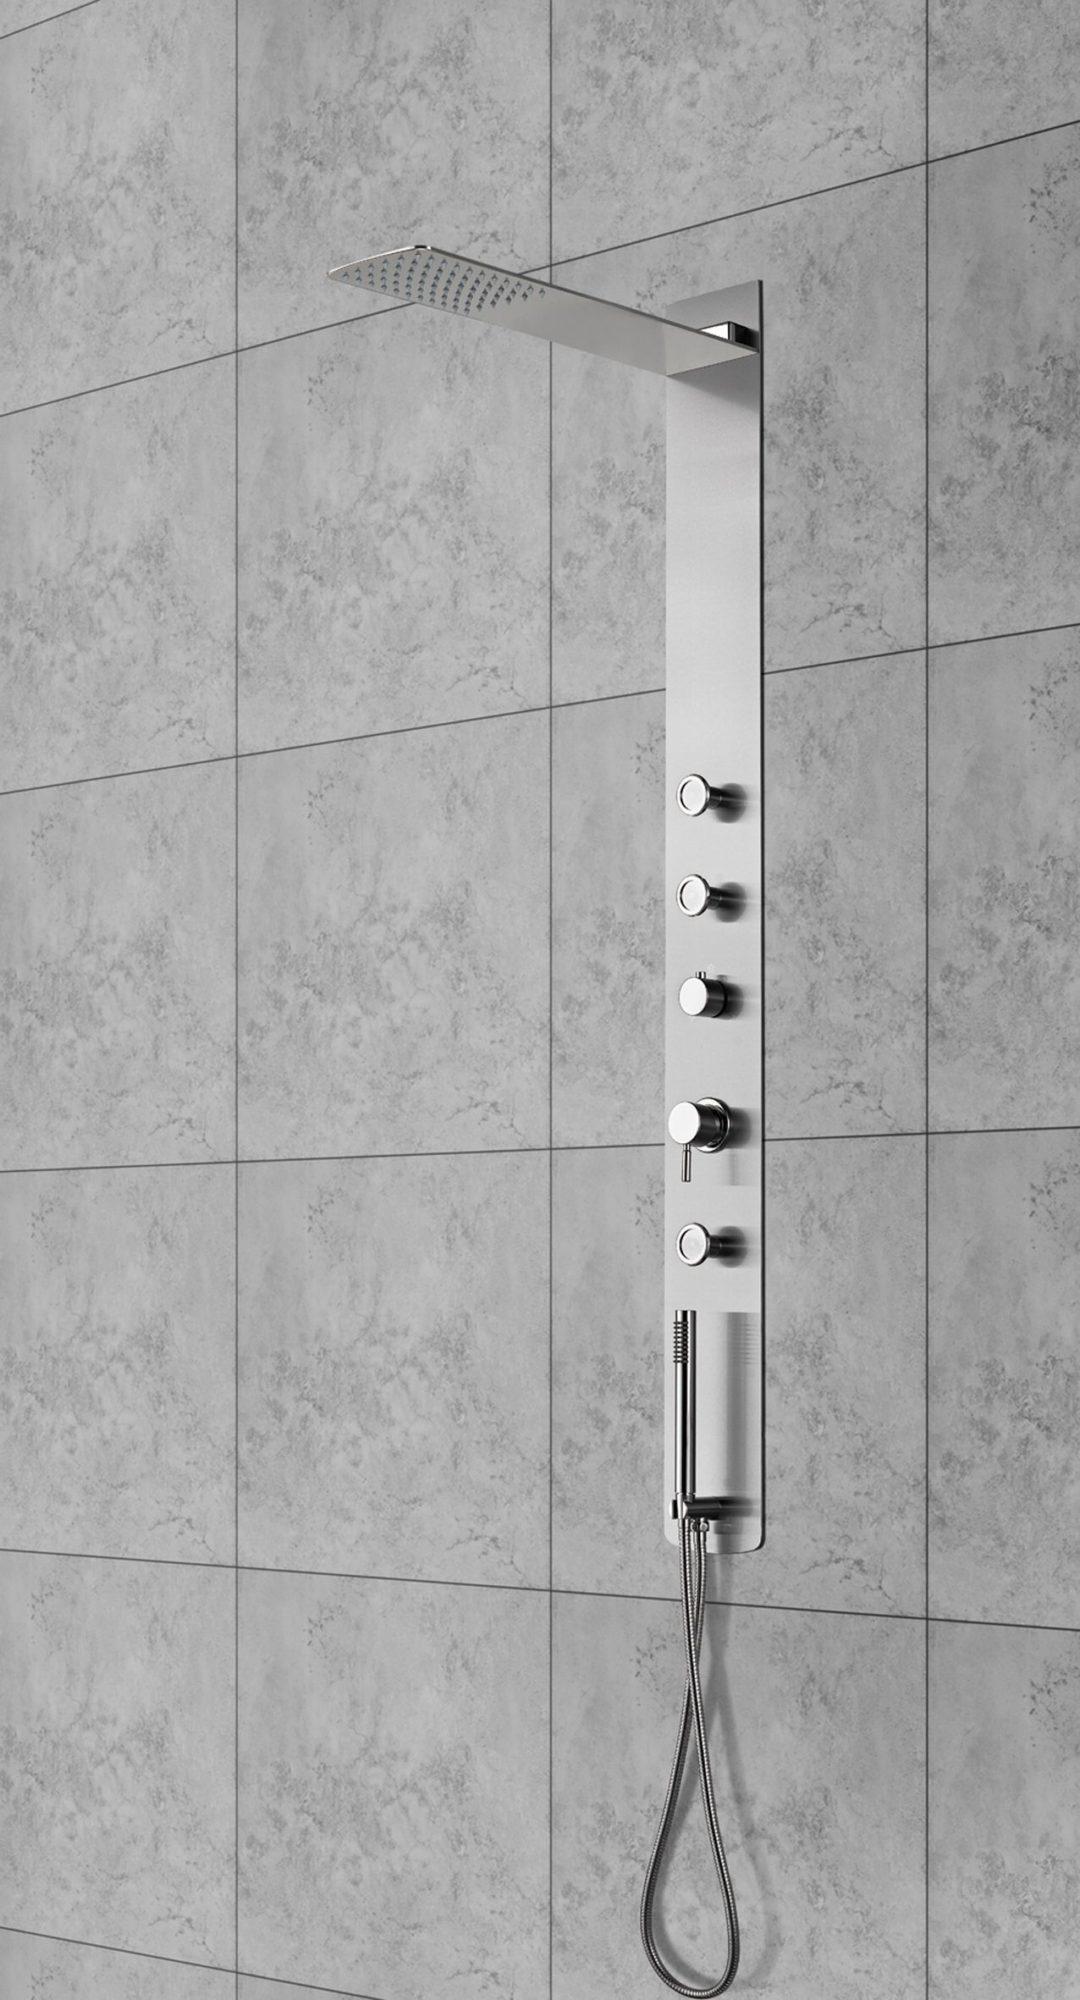 19the-pure-bathroom-collection-from-smiths-briten_rococo-shower-column.jpg